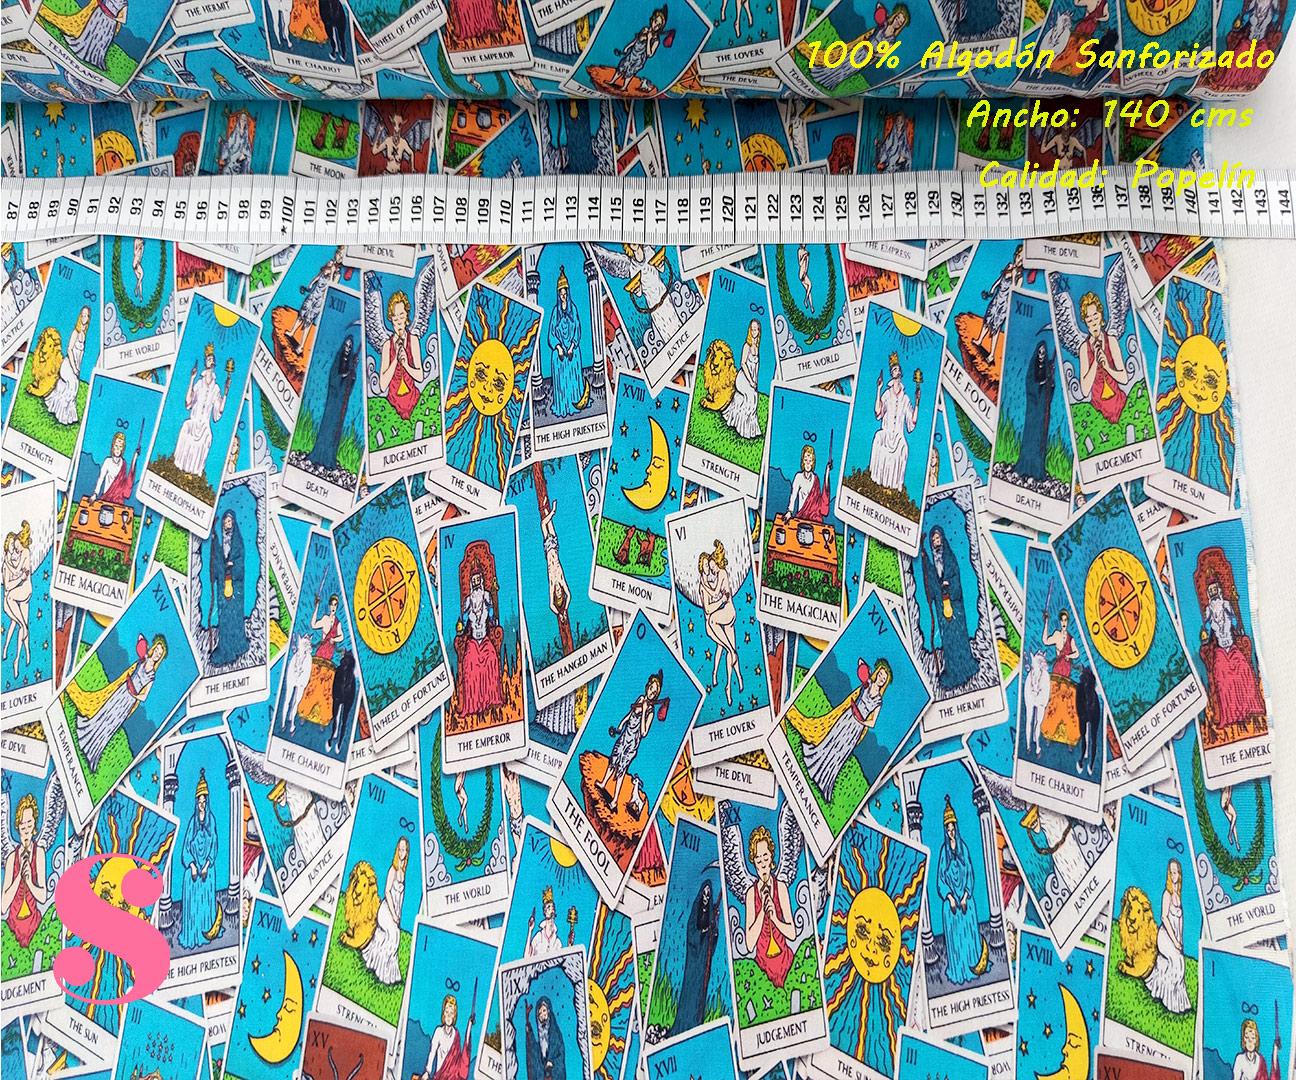 430-cartas-tarot-tejidos-estampado-popelin-sanforizado,Tejido Algodón Estampado Cartas Tarot